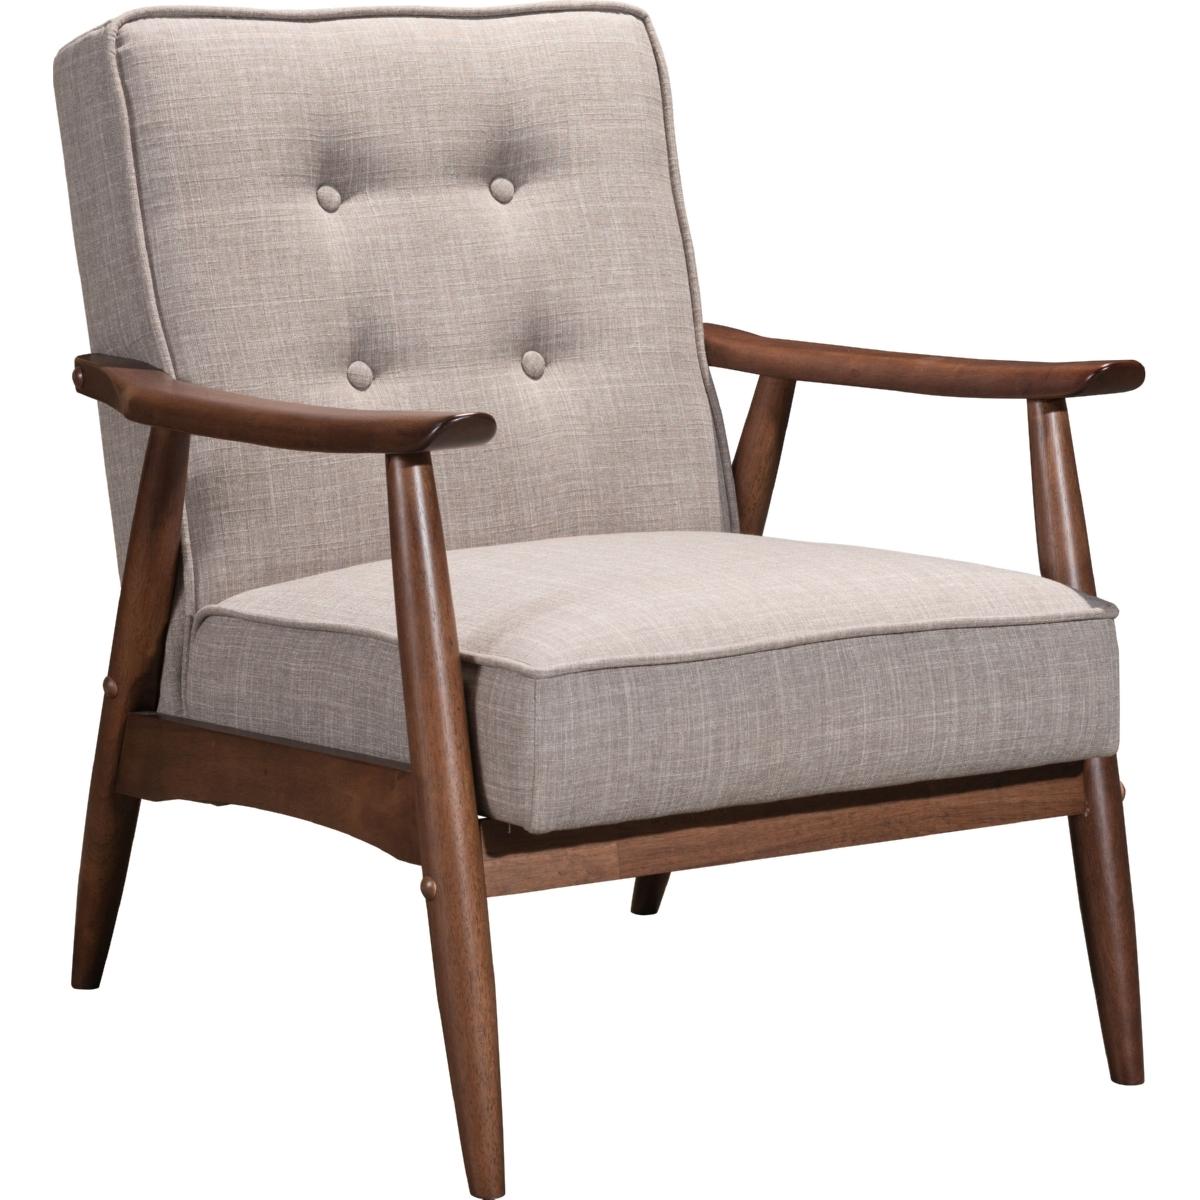 194579 rocky arm chair